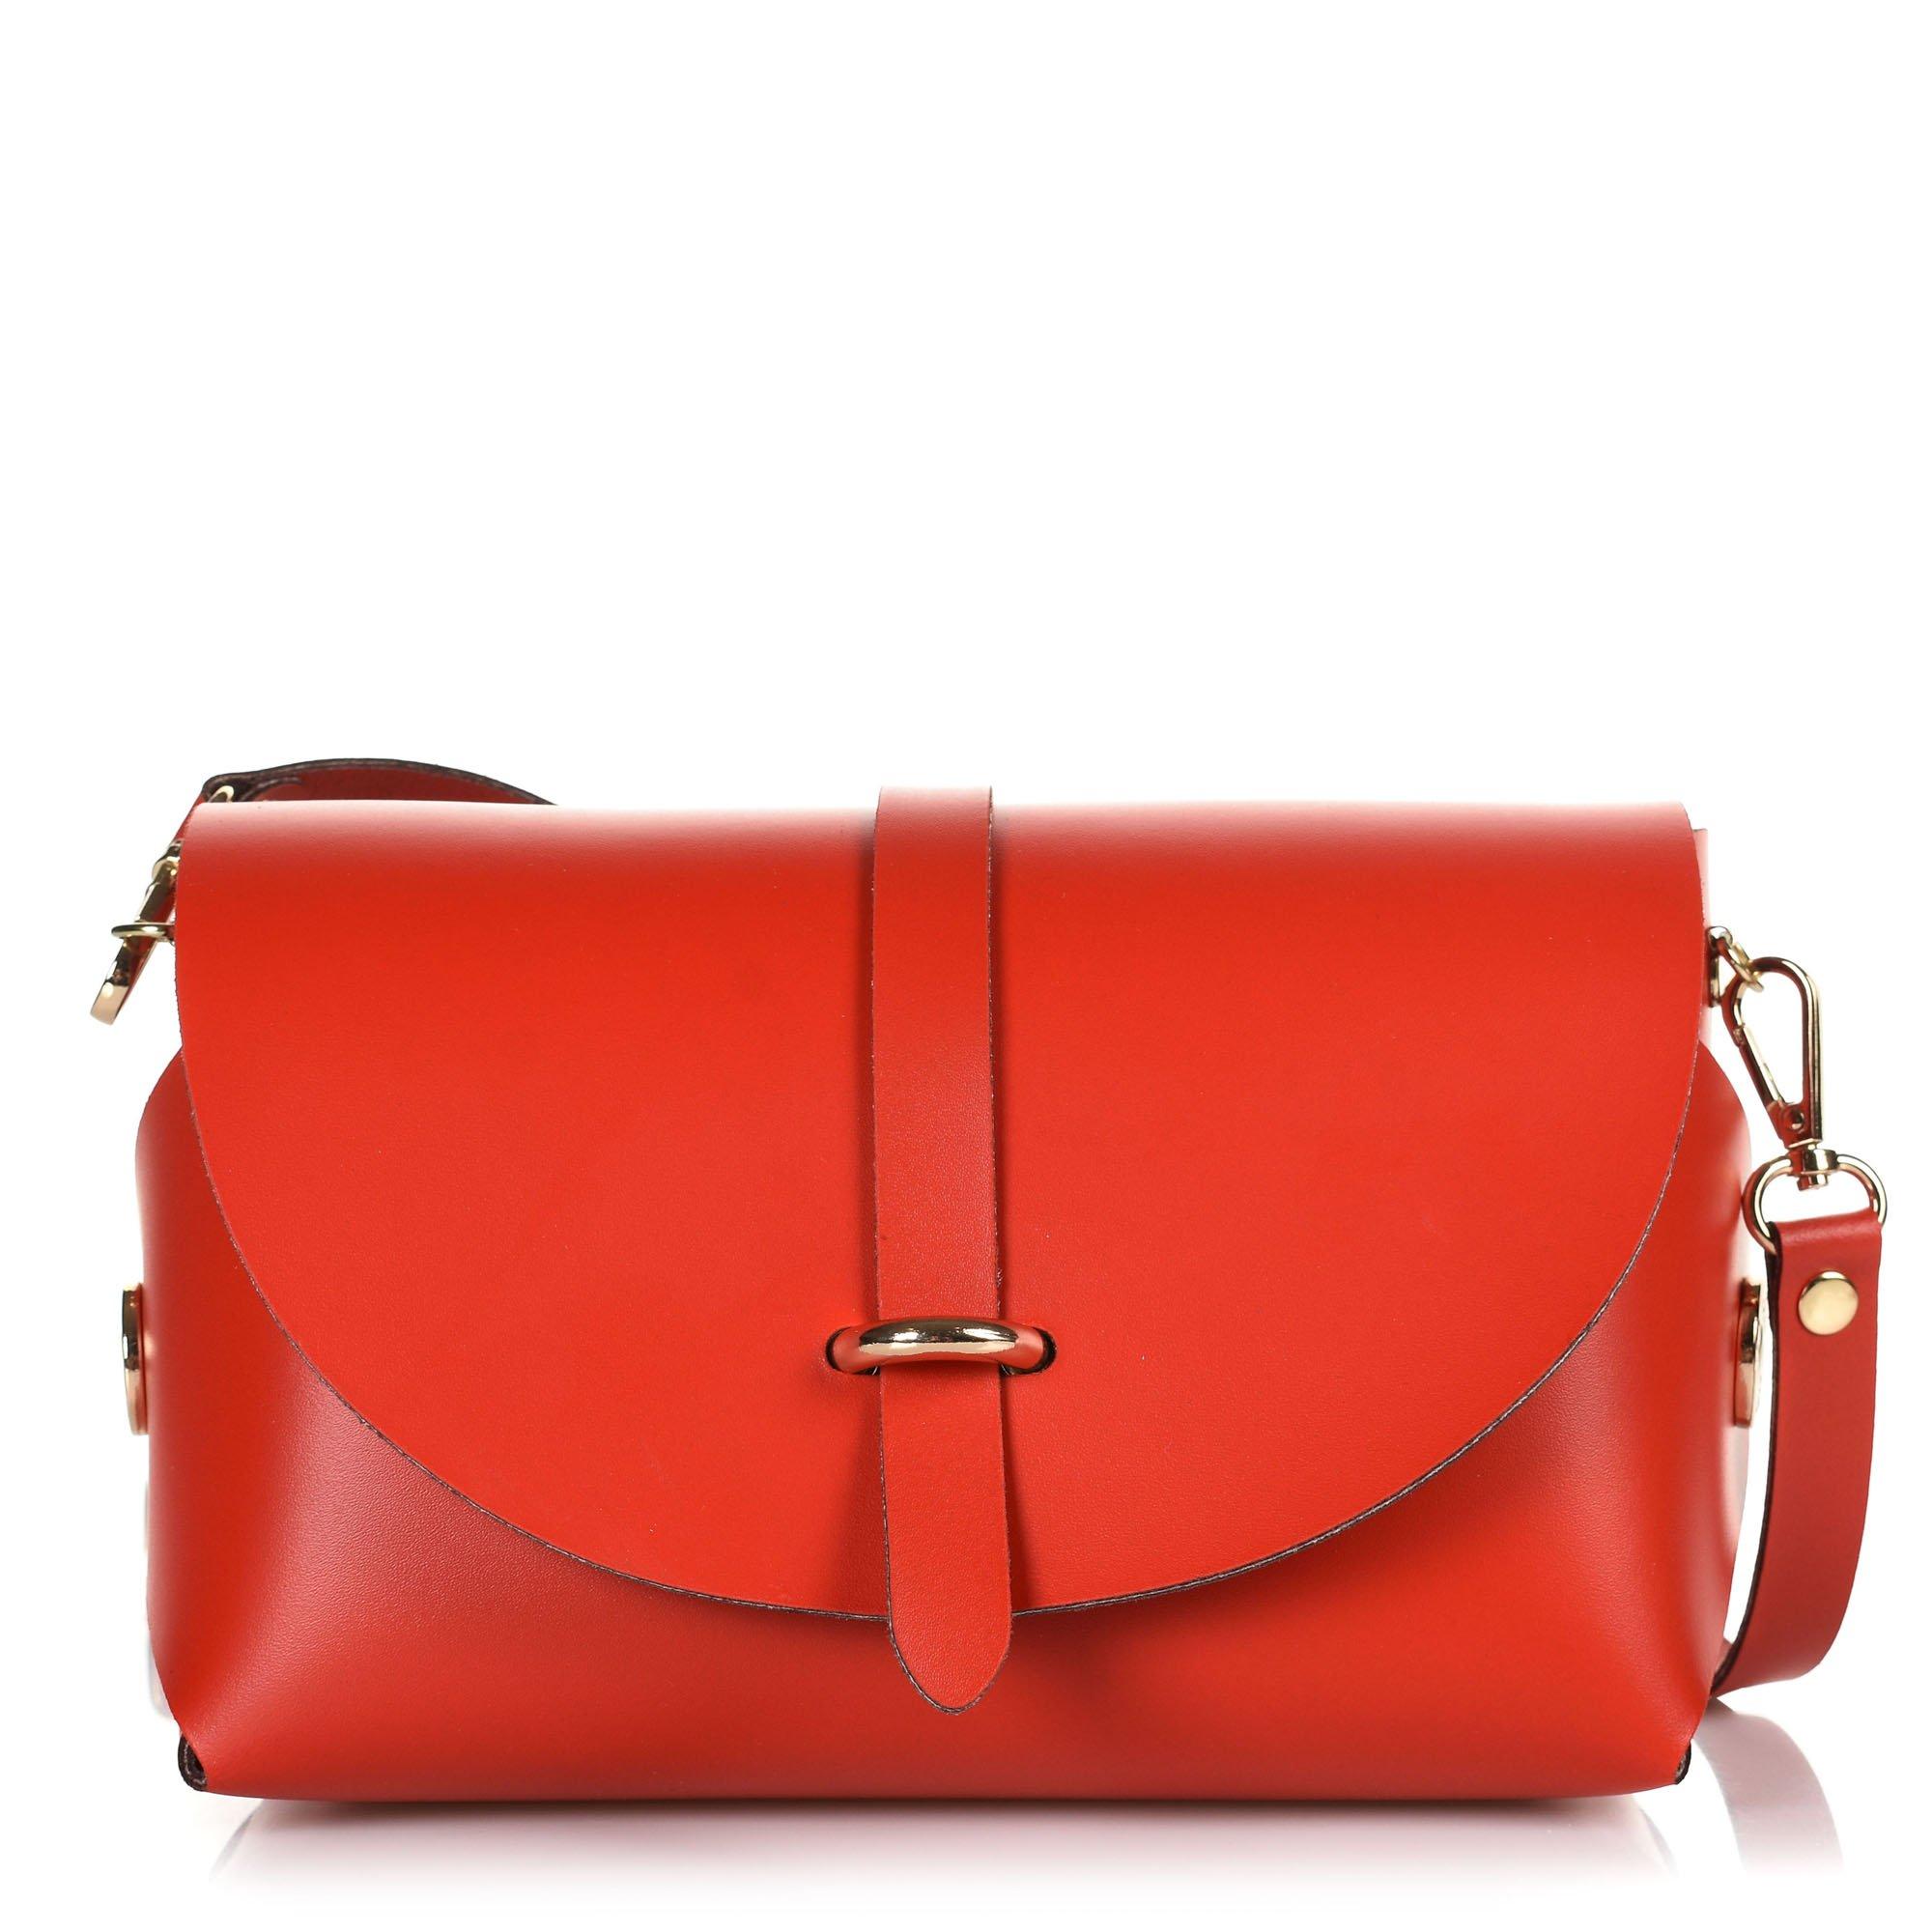 ac4626e2ec Brand Bags Δερμάτινο Τσαντάκι Ώμου-Χιαστί Vice Versa 099130